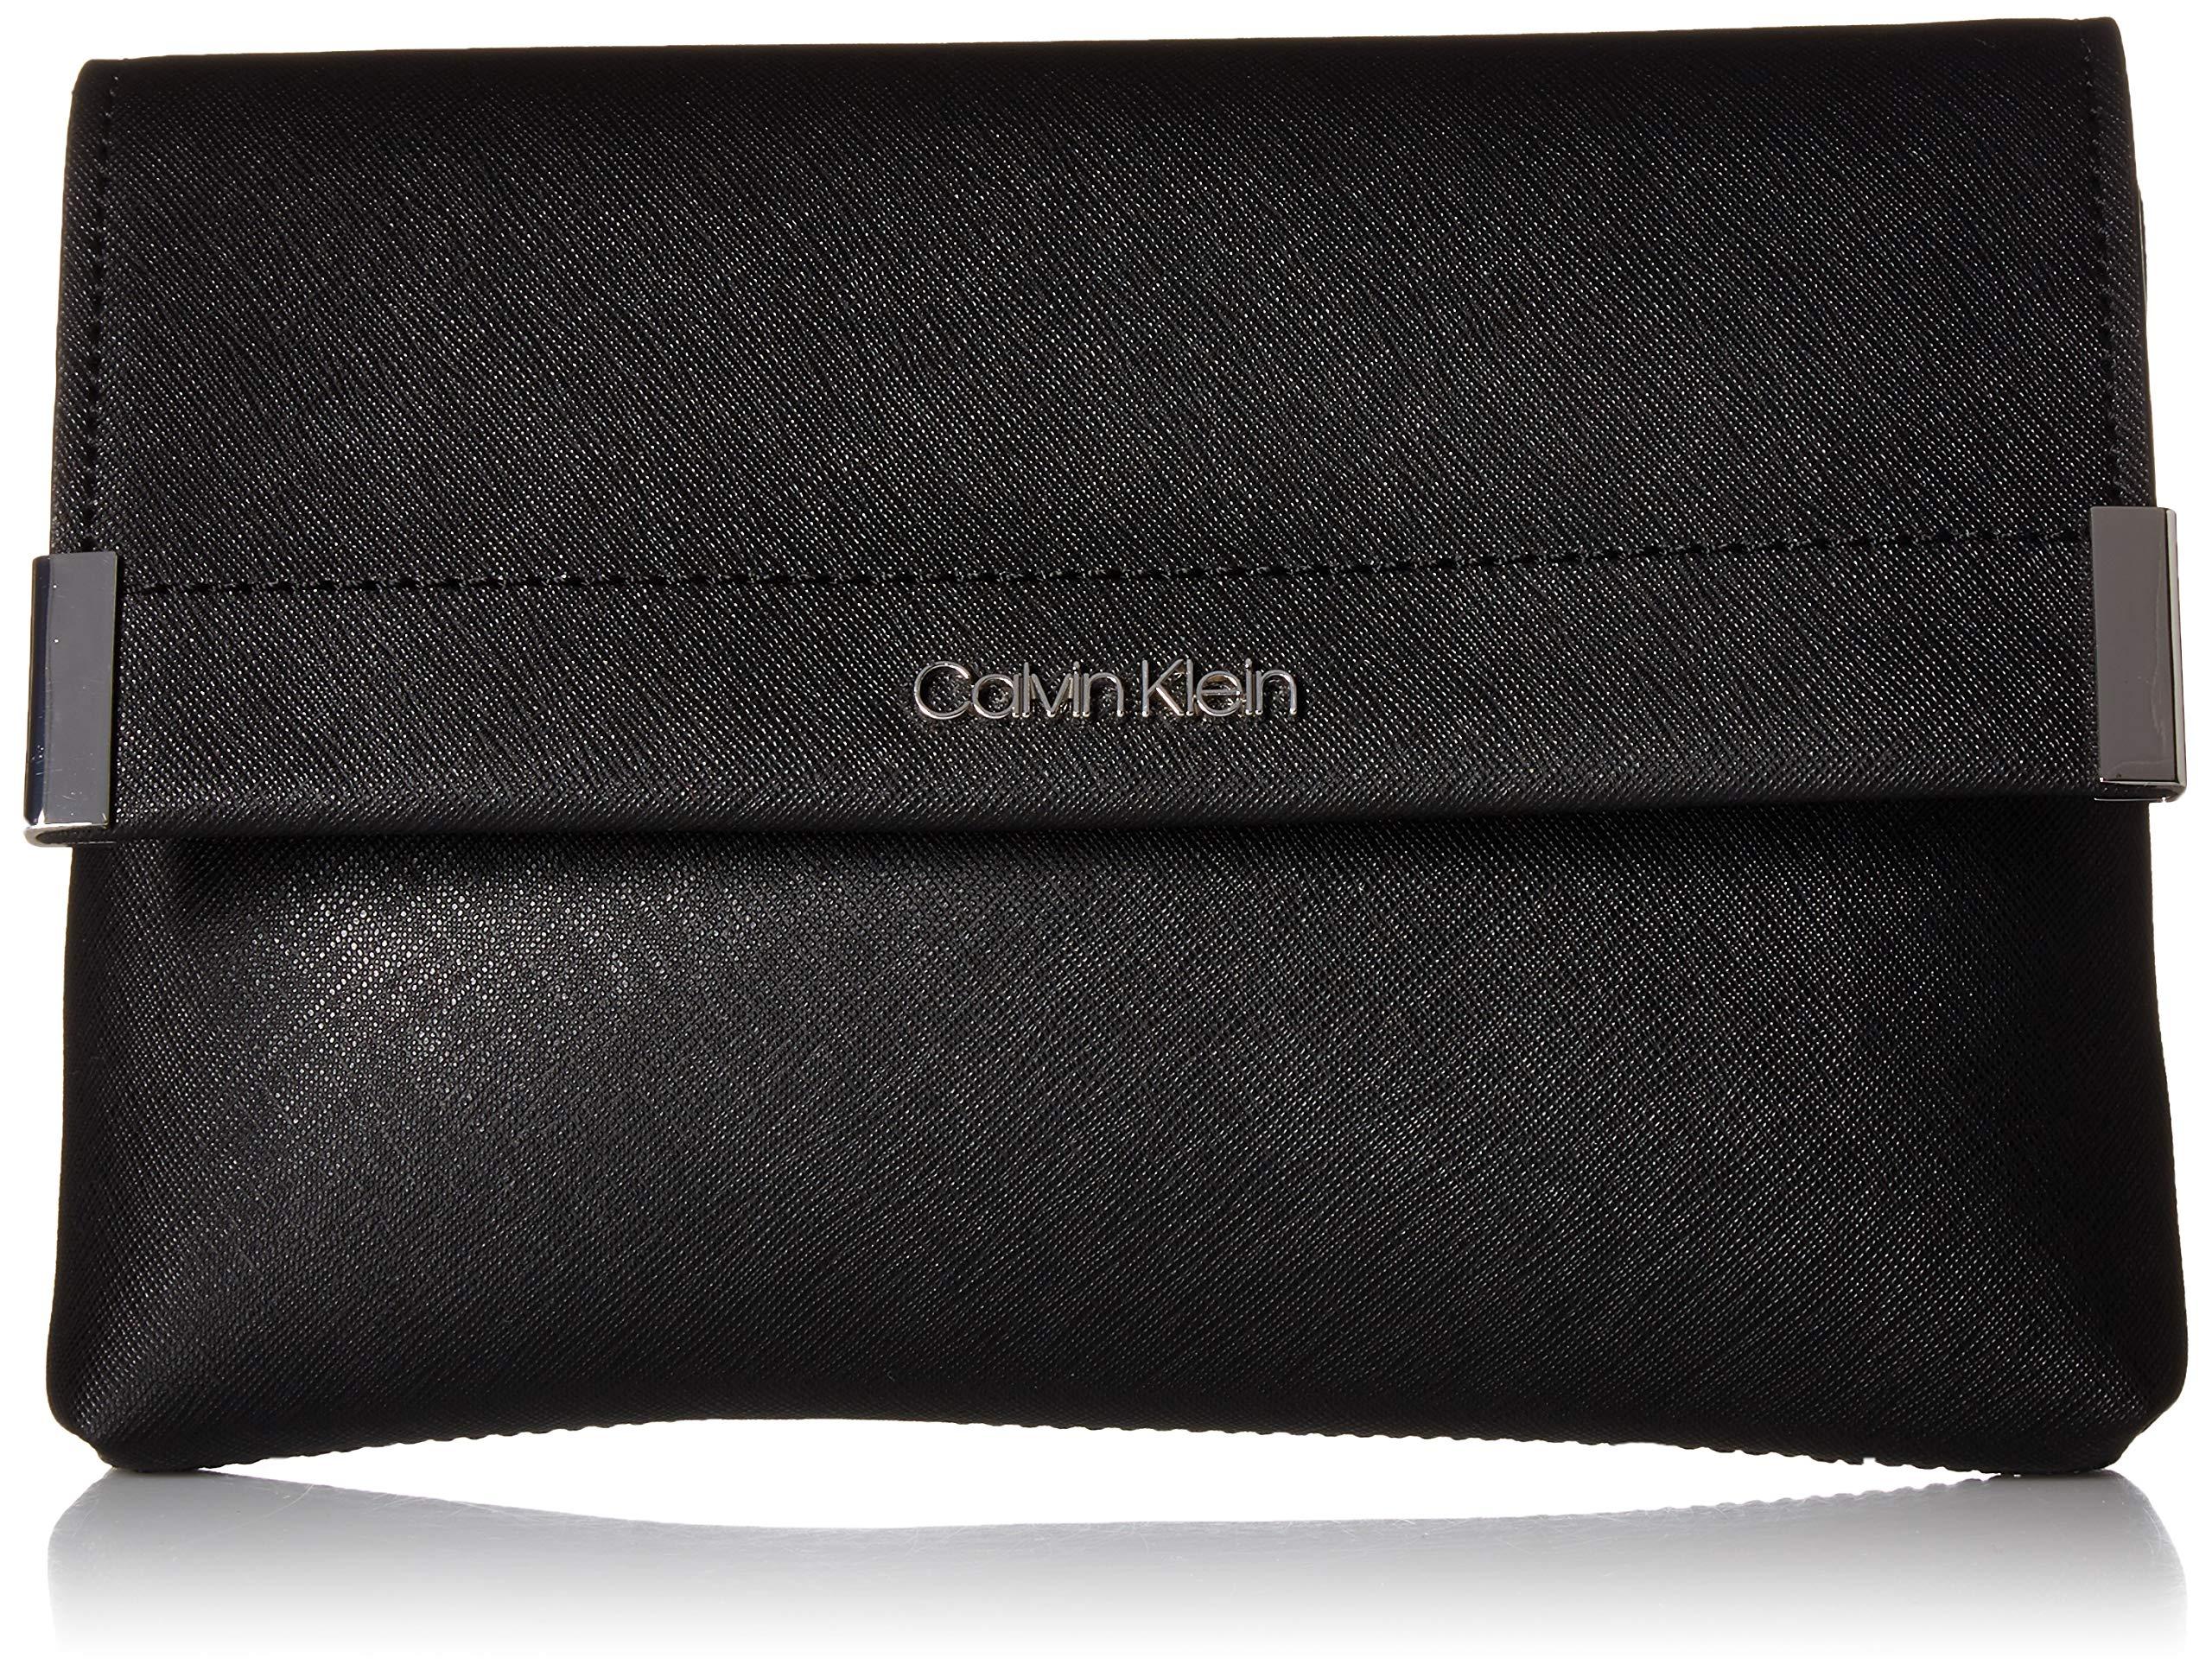 Calvin Klein Raelynn Saffiano Belt Bag Fanny Pack, black/silver